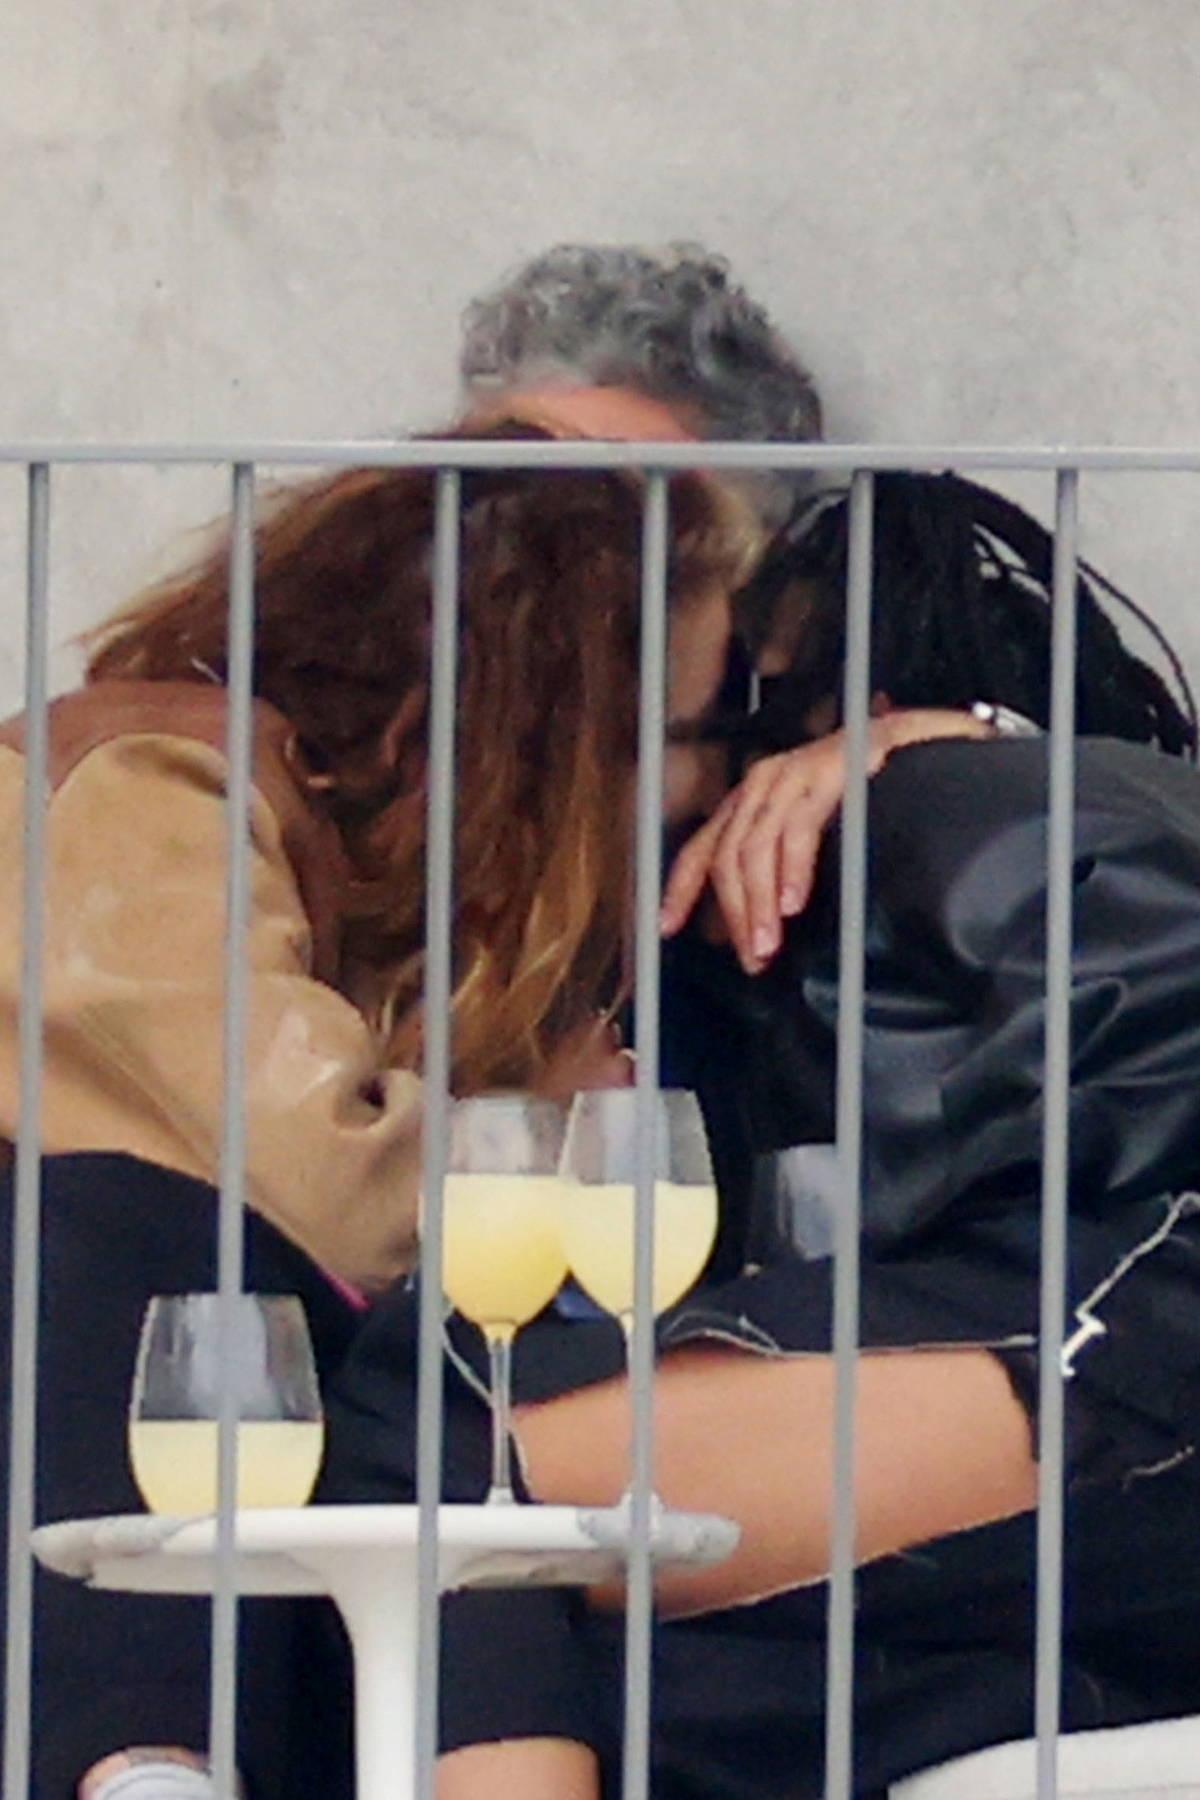 Rita Ora spotted kissing Tessa Thompson and boyfriend Taika Waititi at his place in Sydney, Australia